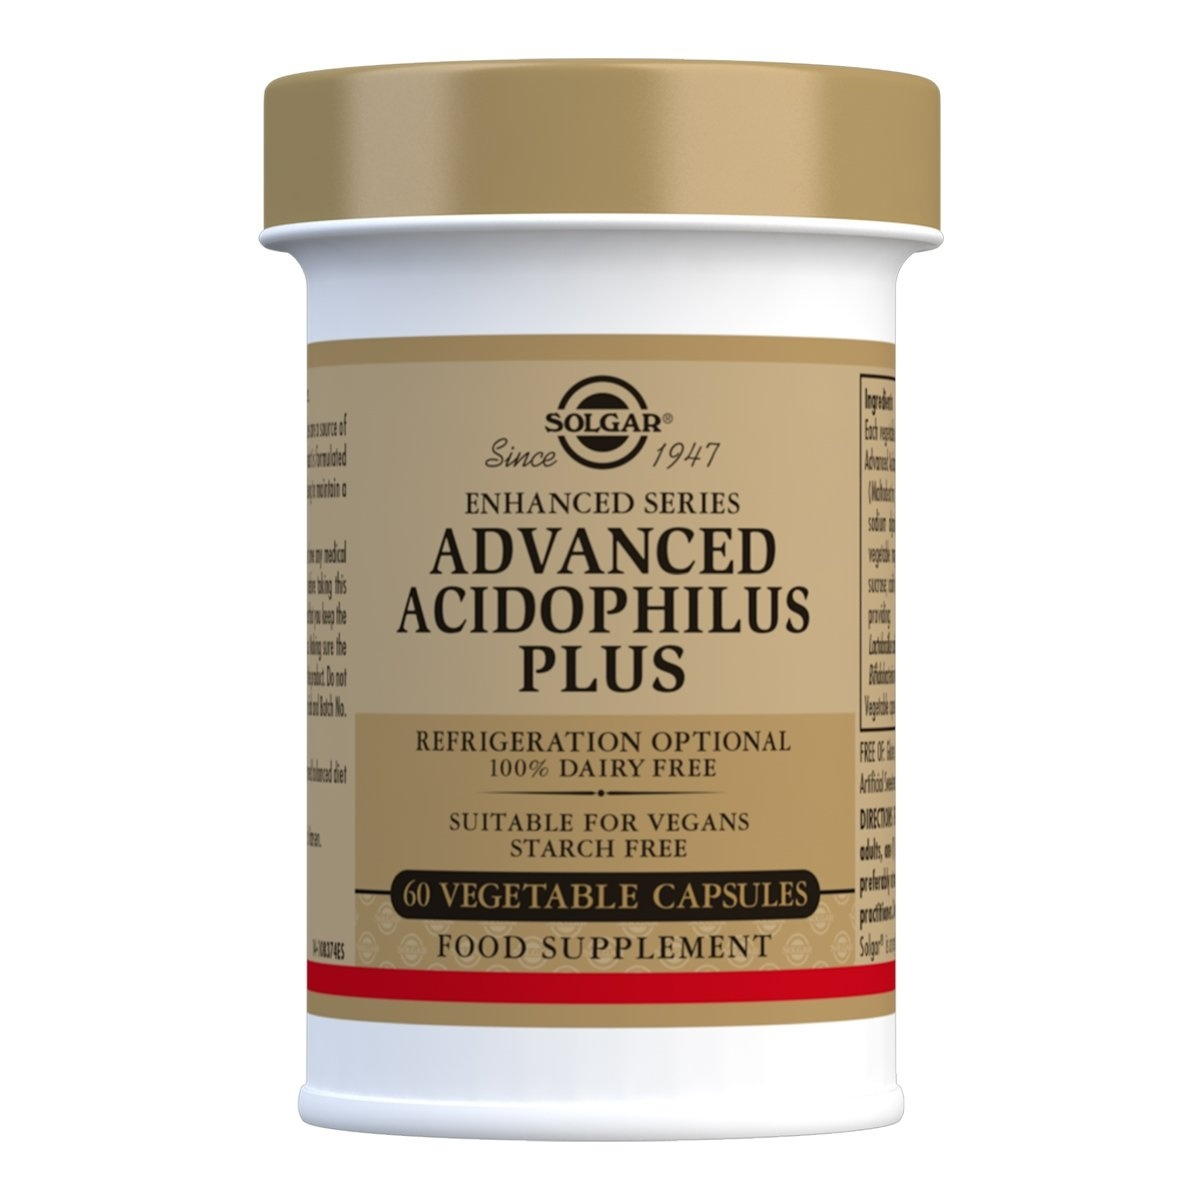 Solgar Advanced Acidophilus Plus Vegetable Capsules - Pack of 60